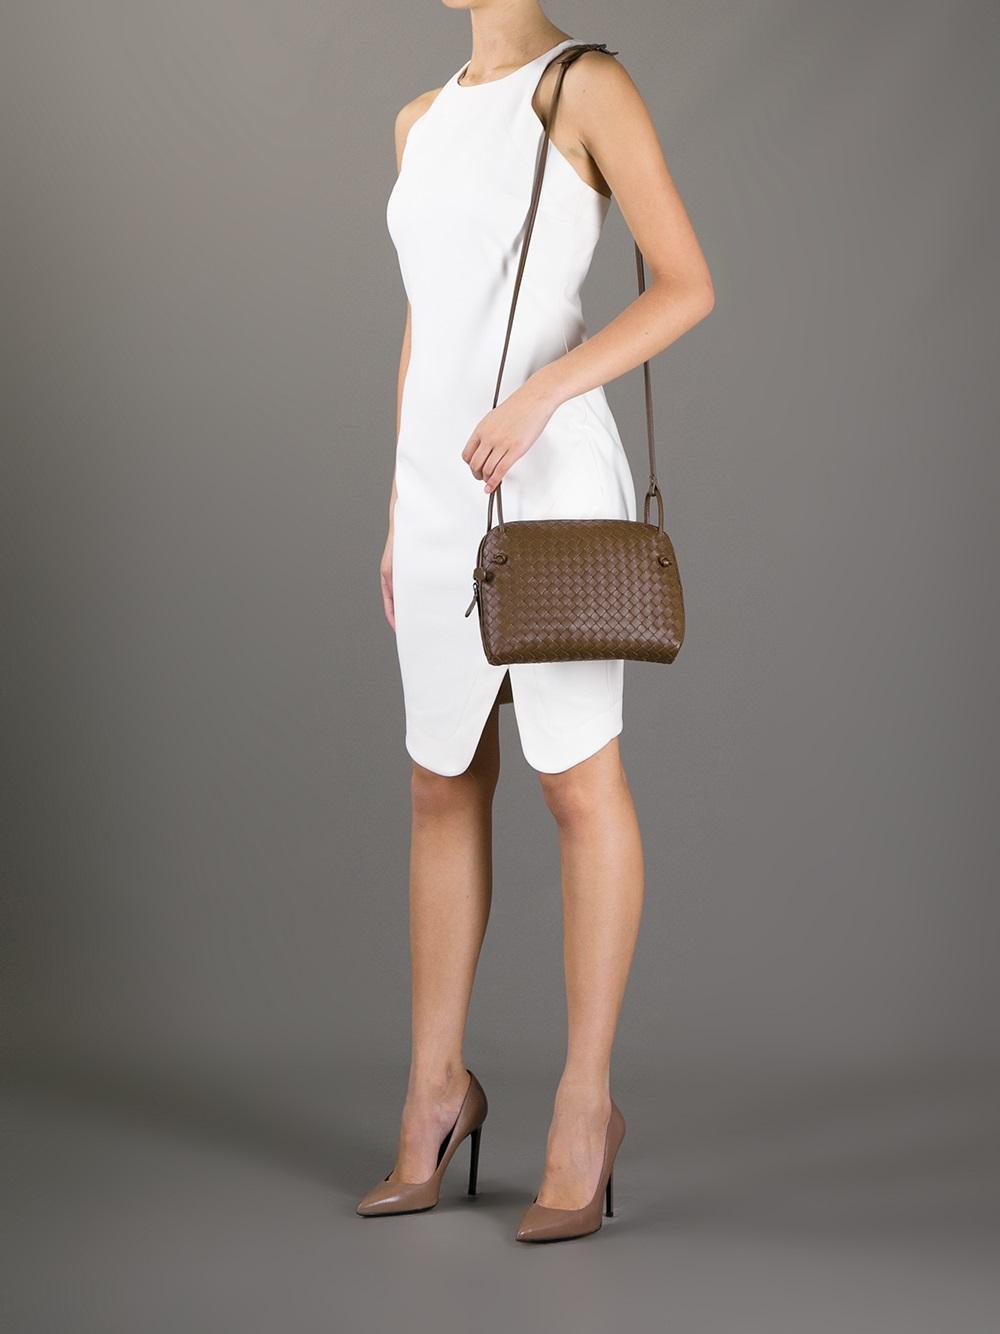 a2813e316532 Lyst - Bottega Veneta Junior Cross Body Bag in Brown